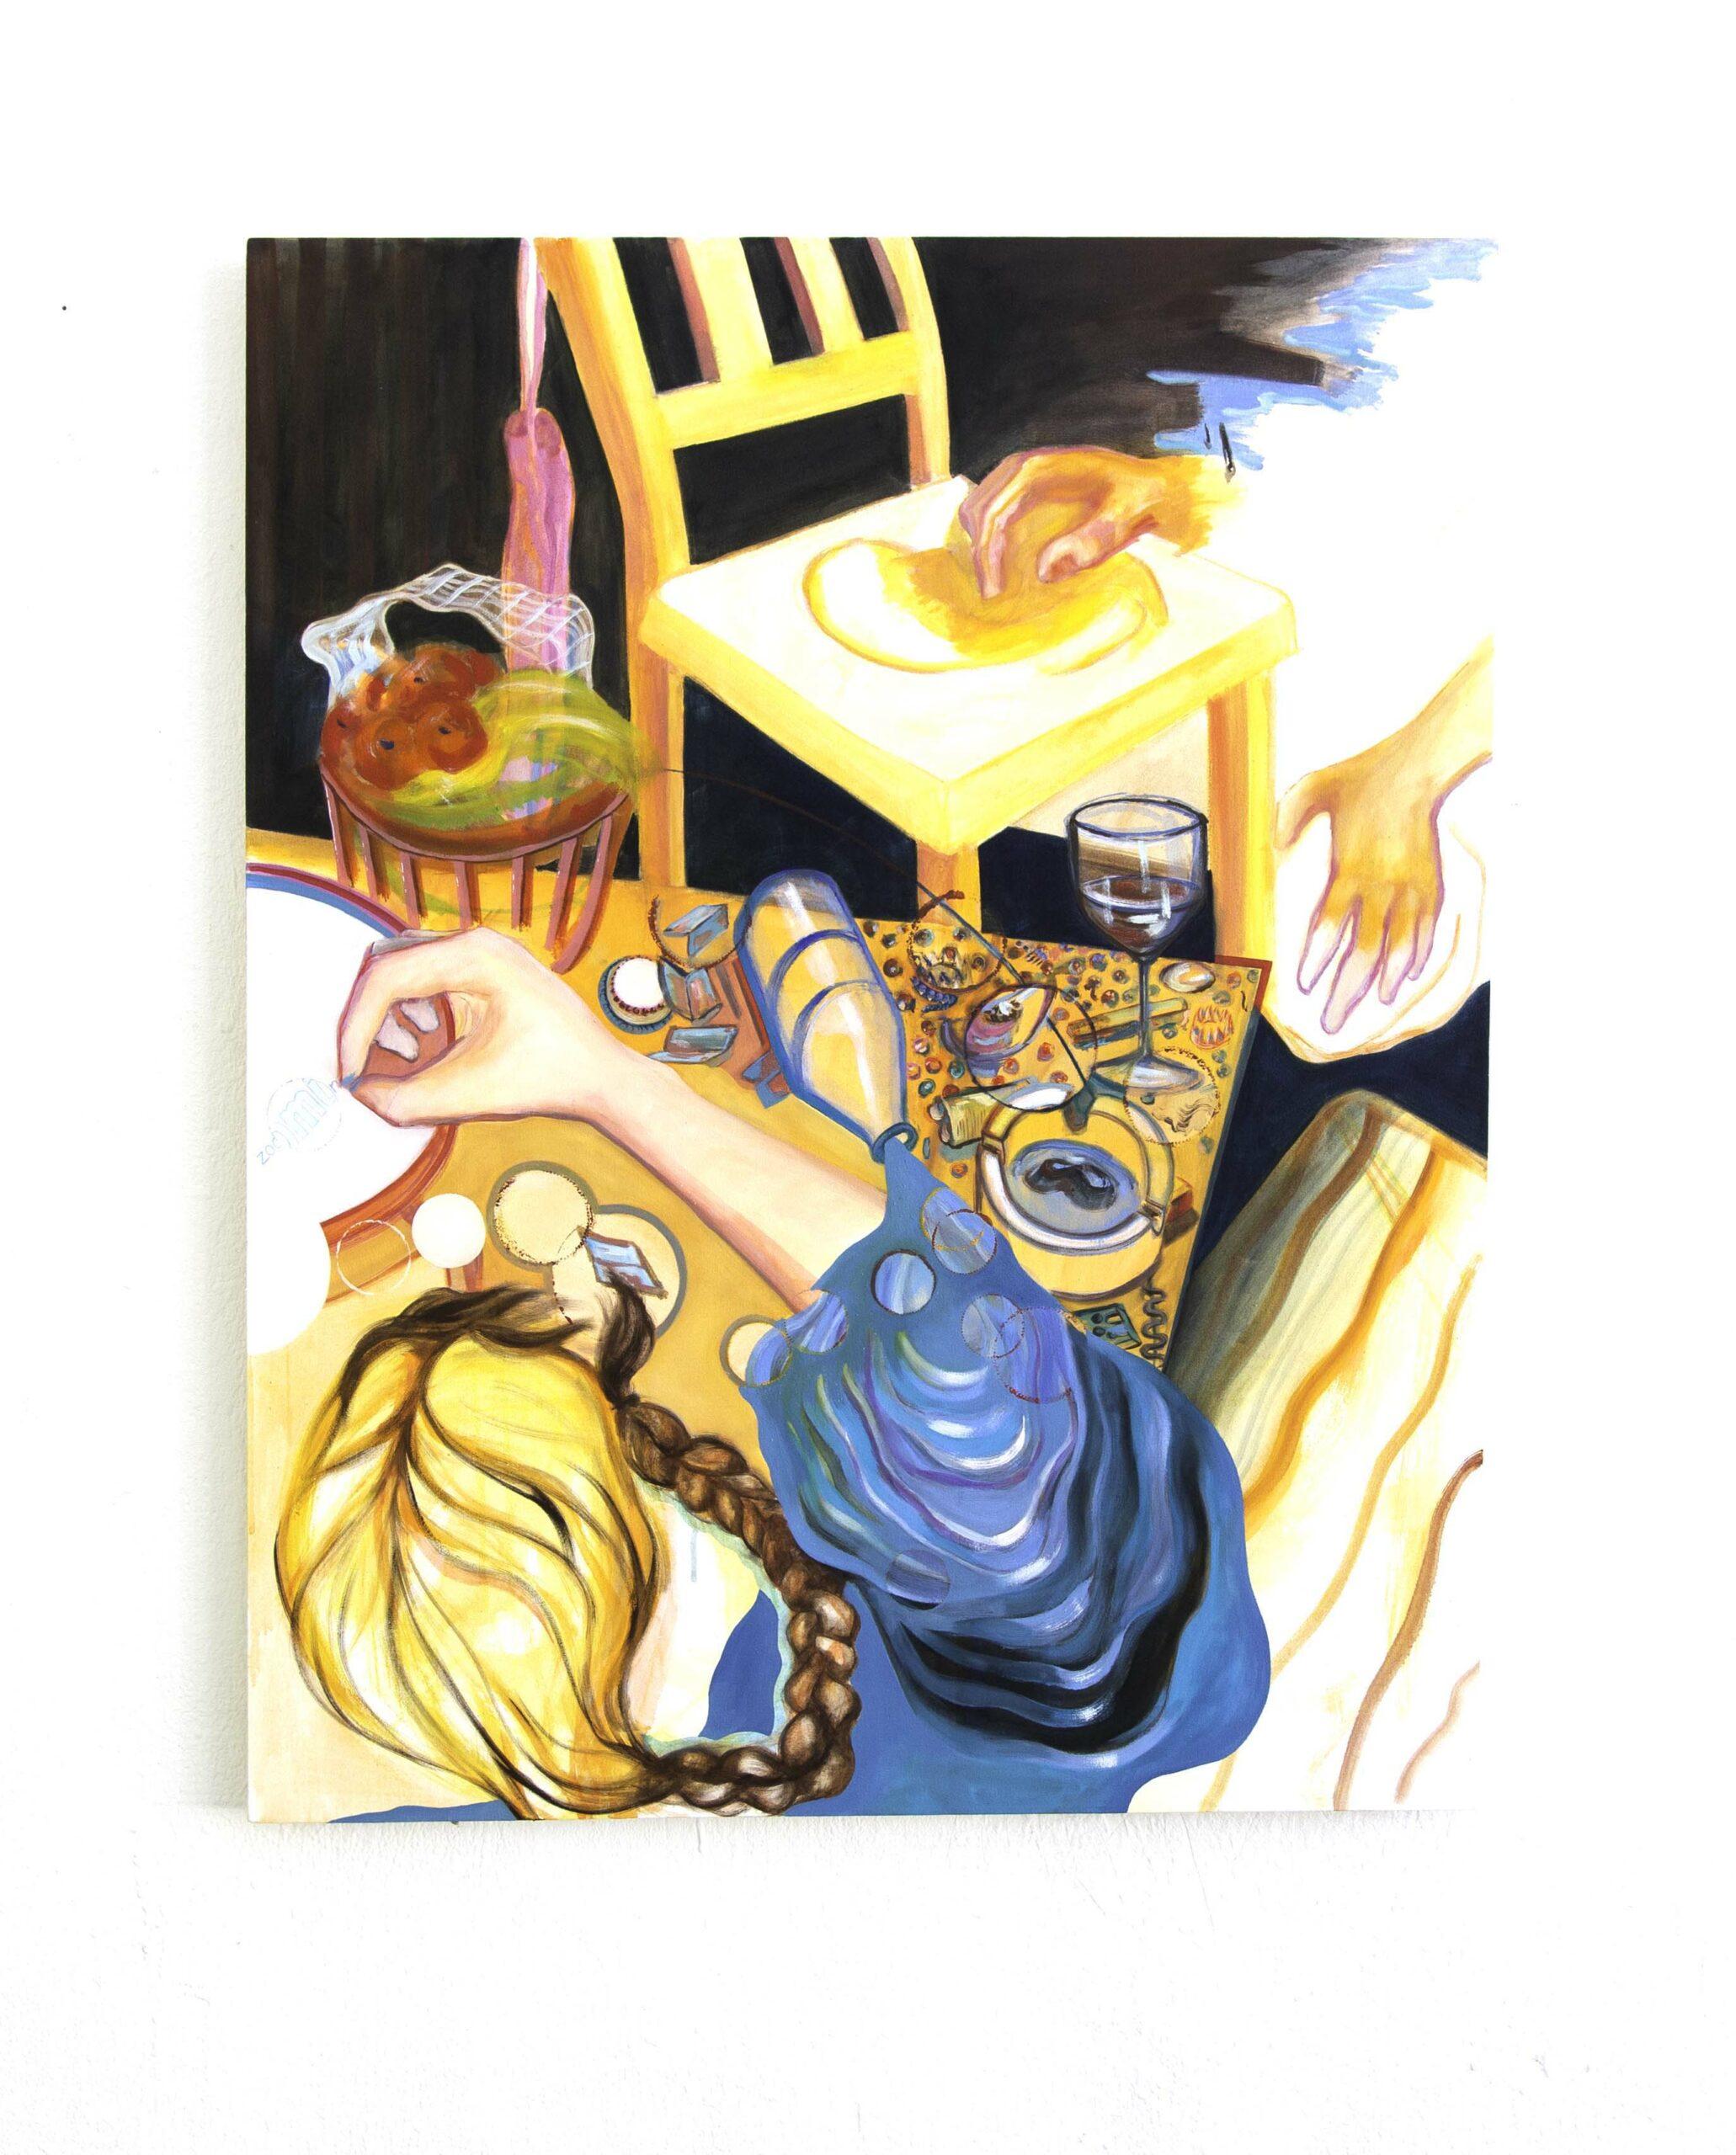 the activity night, 100x140 cm, oil on canvas